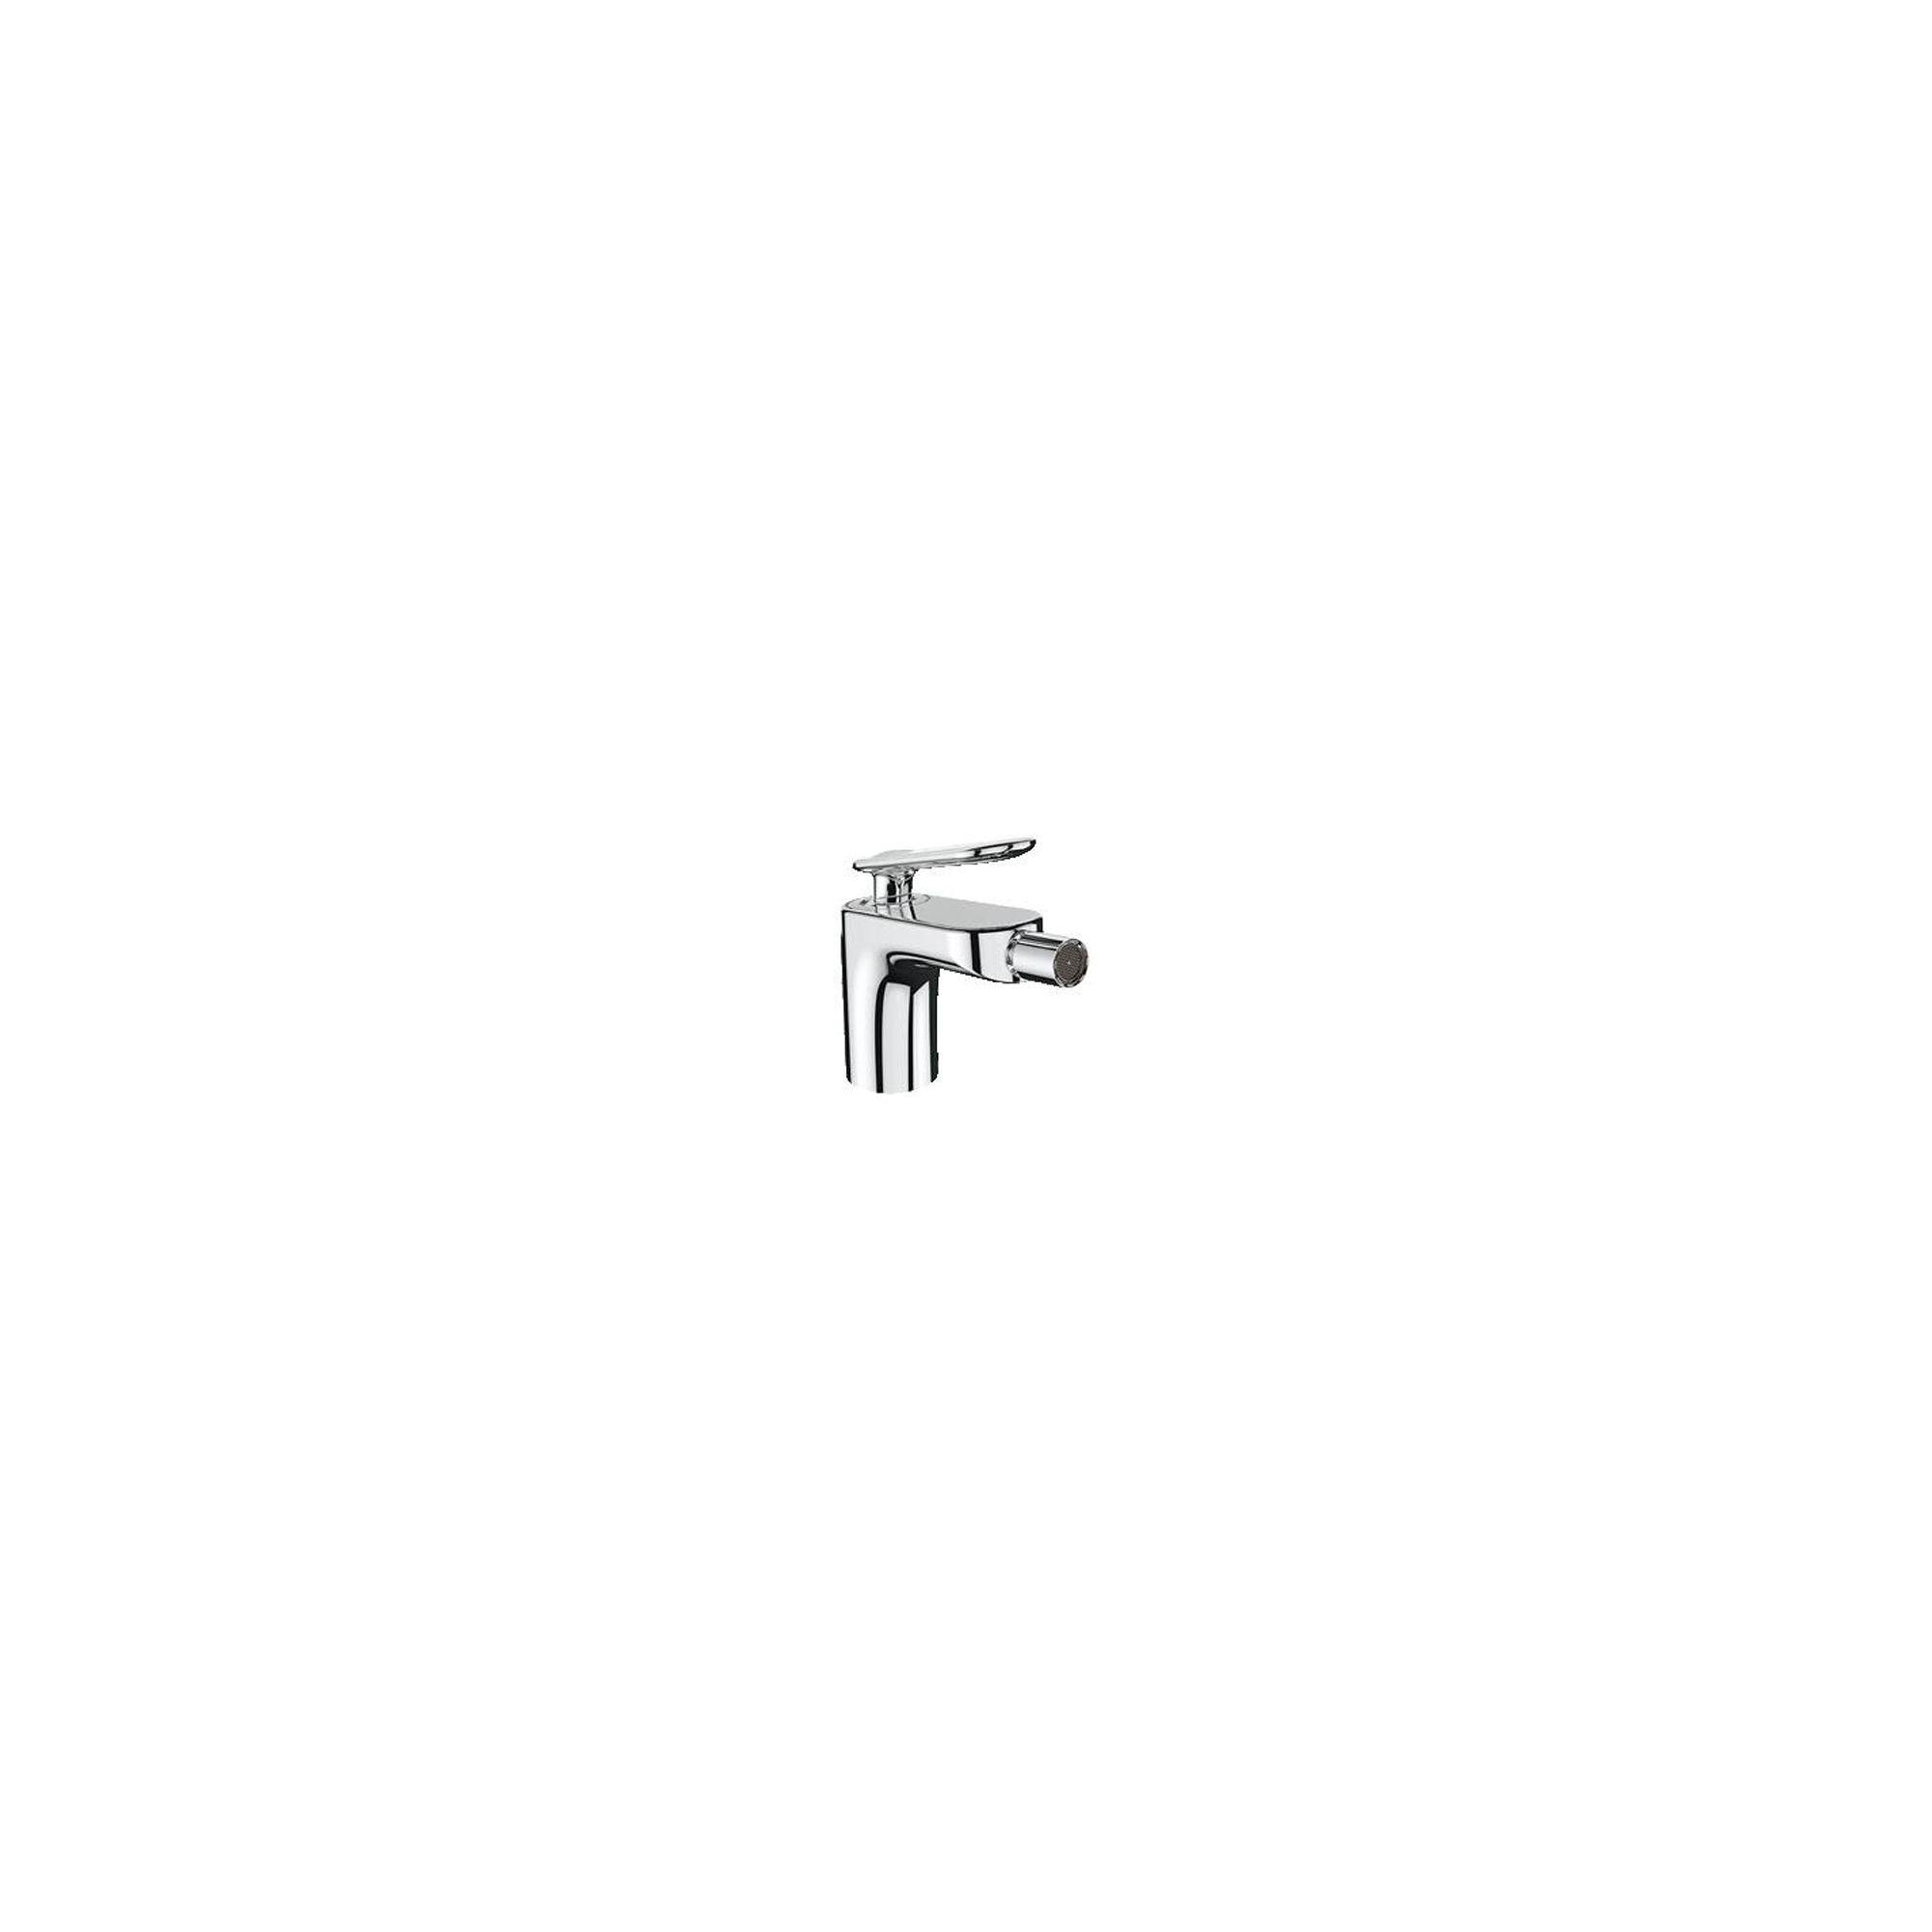 Grohe Ondus Veris Mono Bidet Mixer Tap, Single Handle, Chrome at Tesco Direct